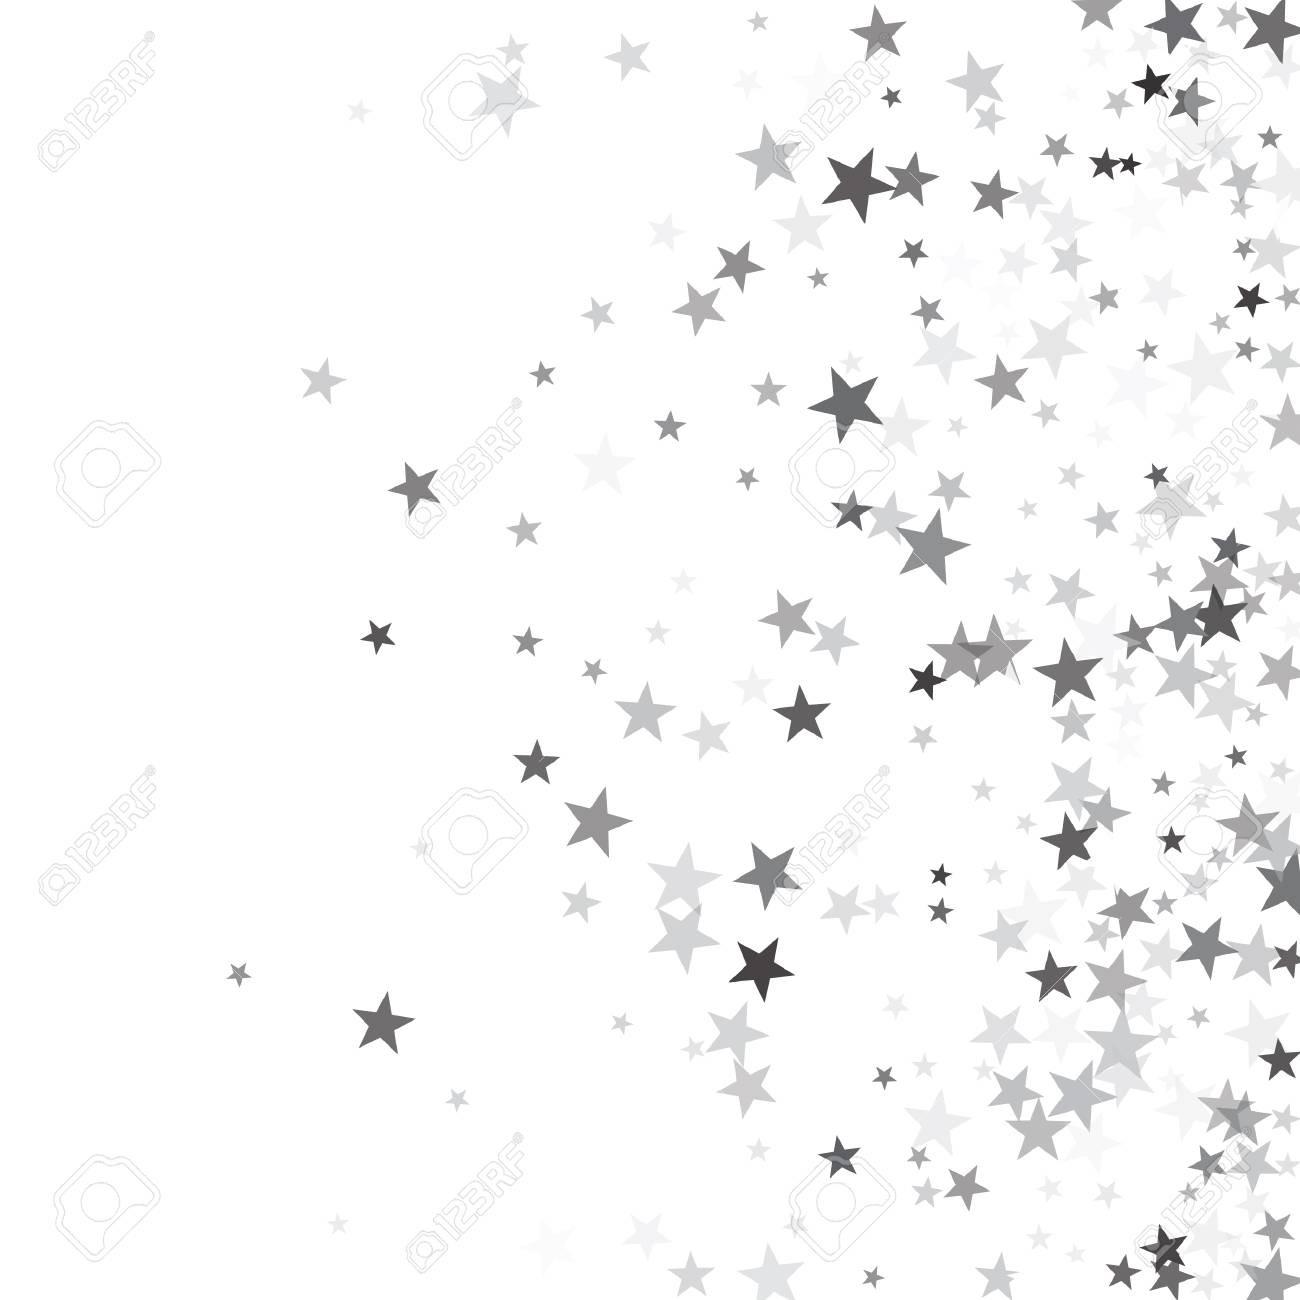 1300x1300 95251304 Luxurious Silver Glitter Falling Stars Vector Template